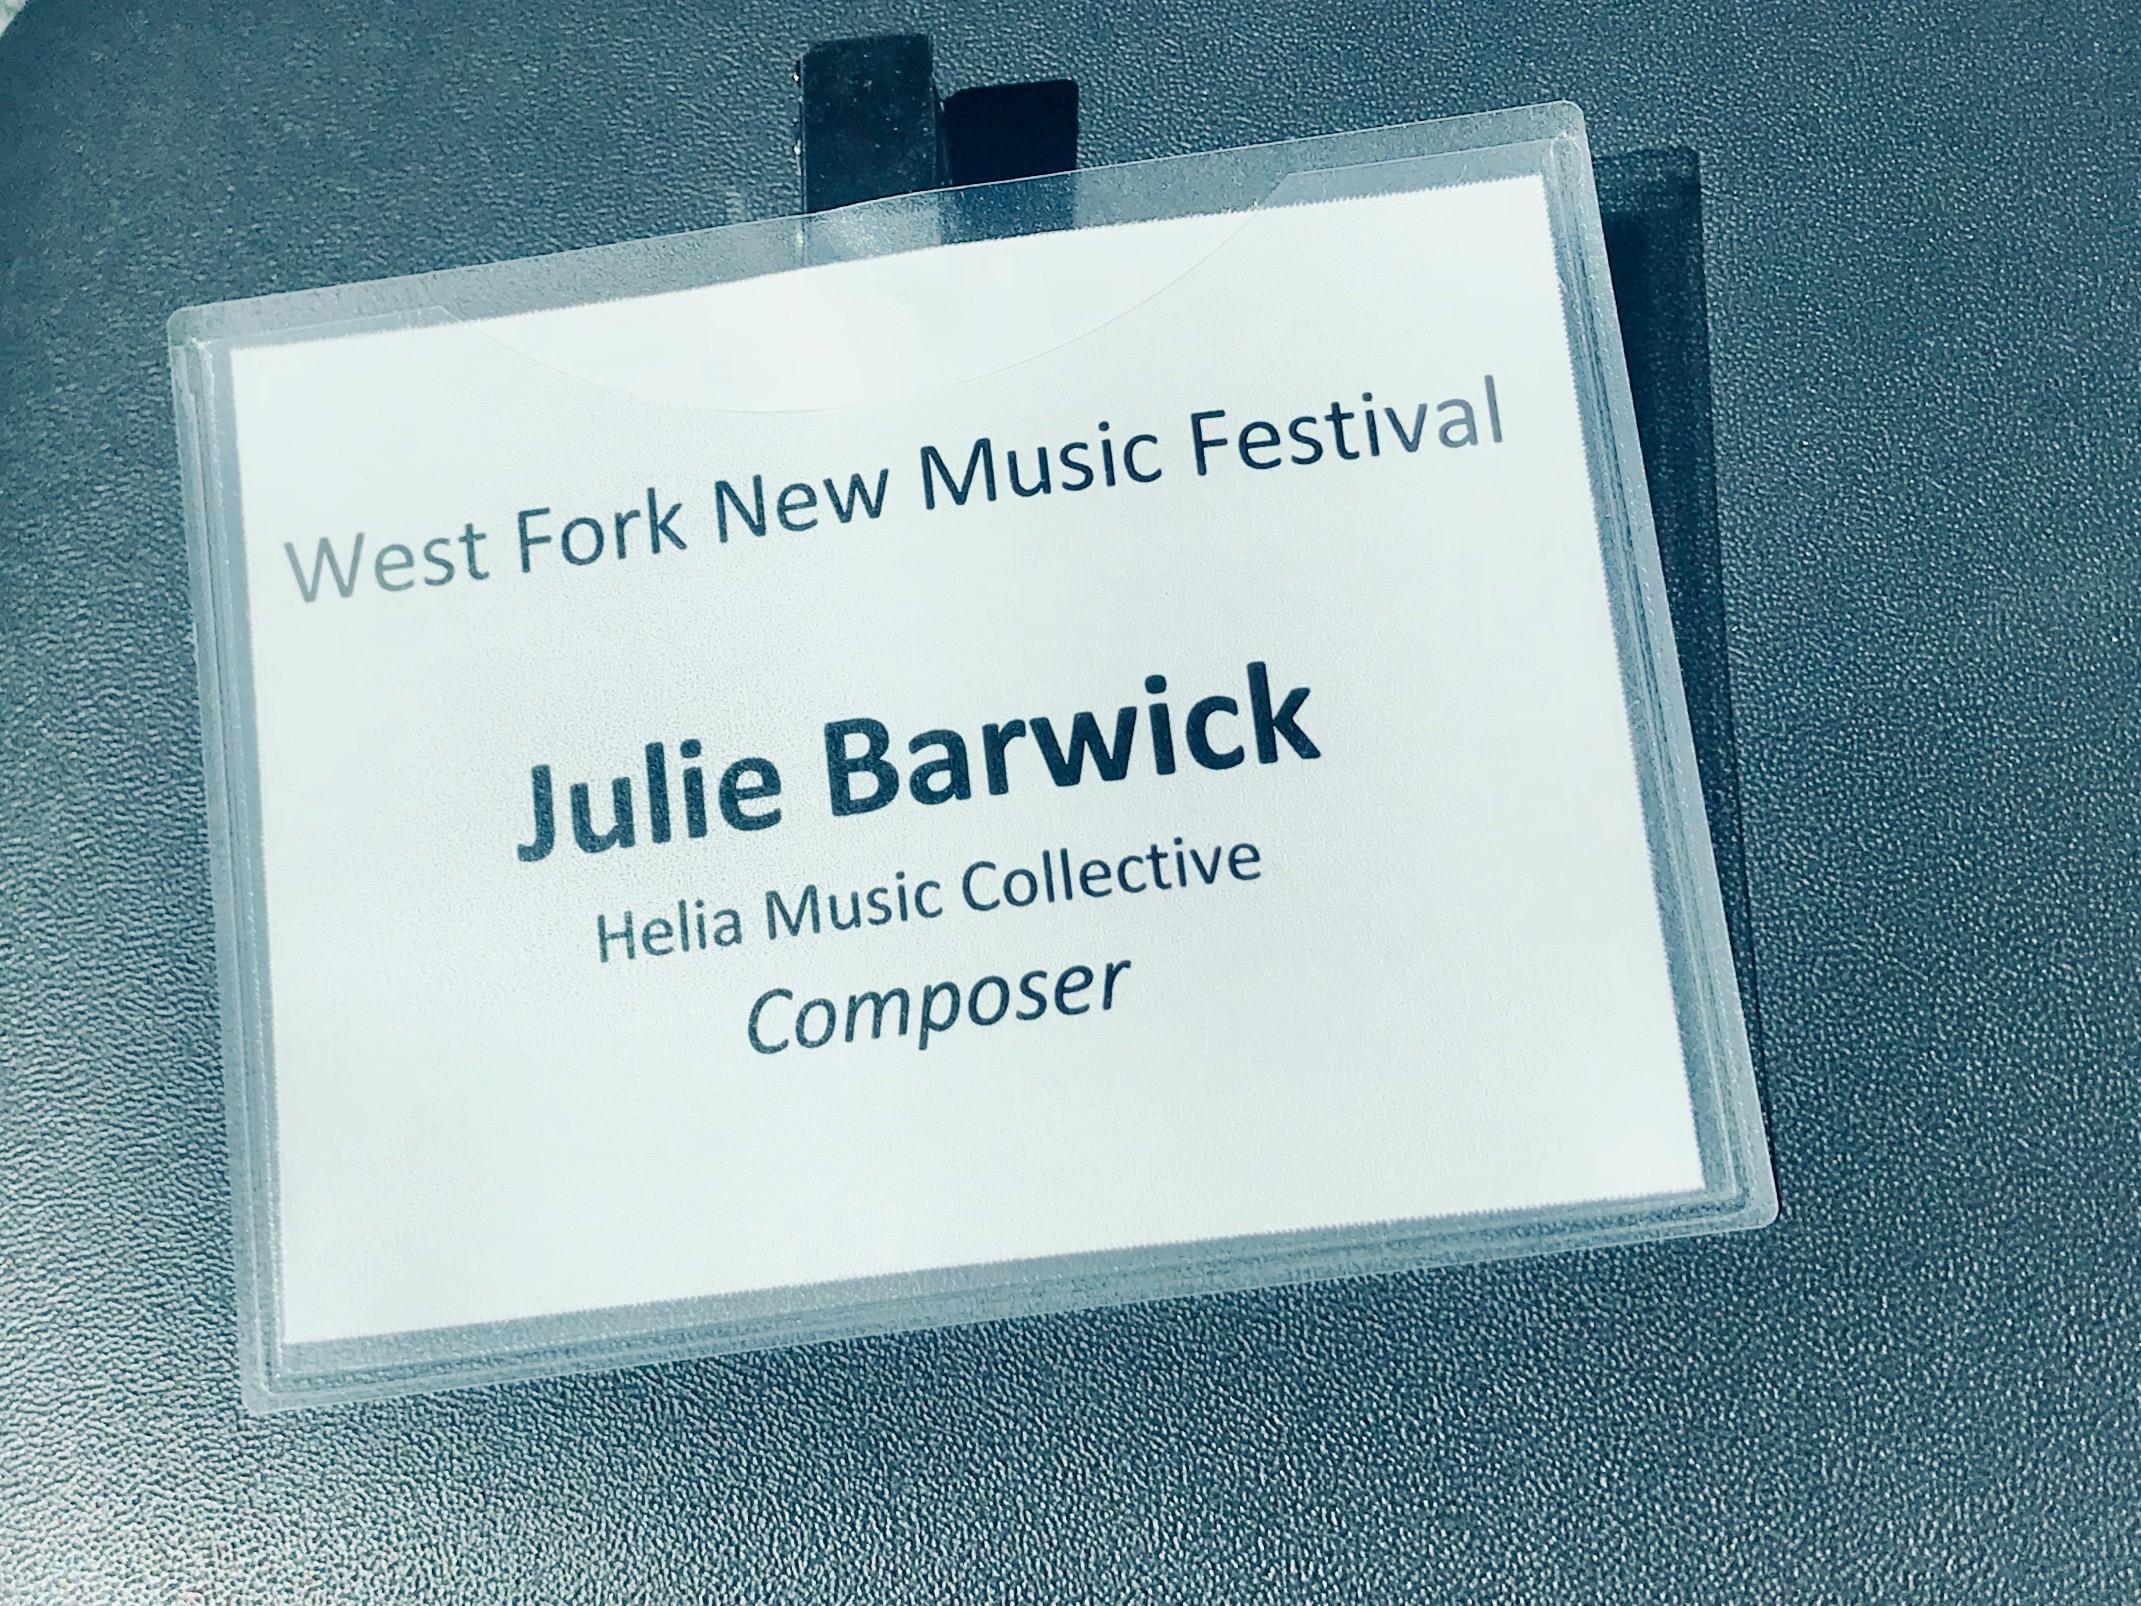 west-fork-new-music-festival-2018-nametag.jpeg